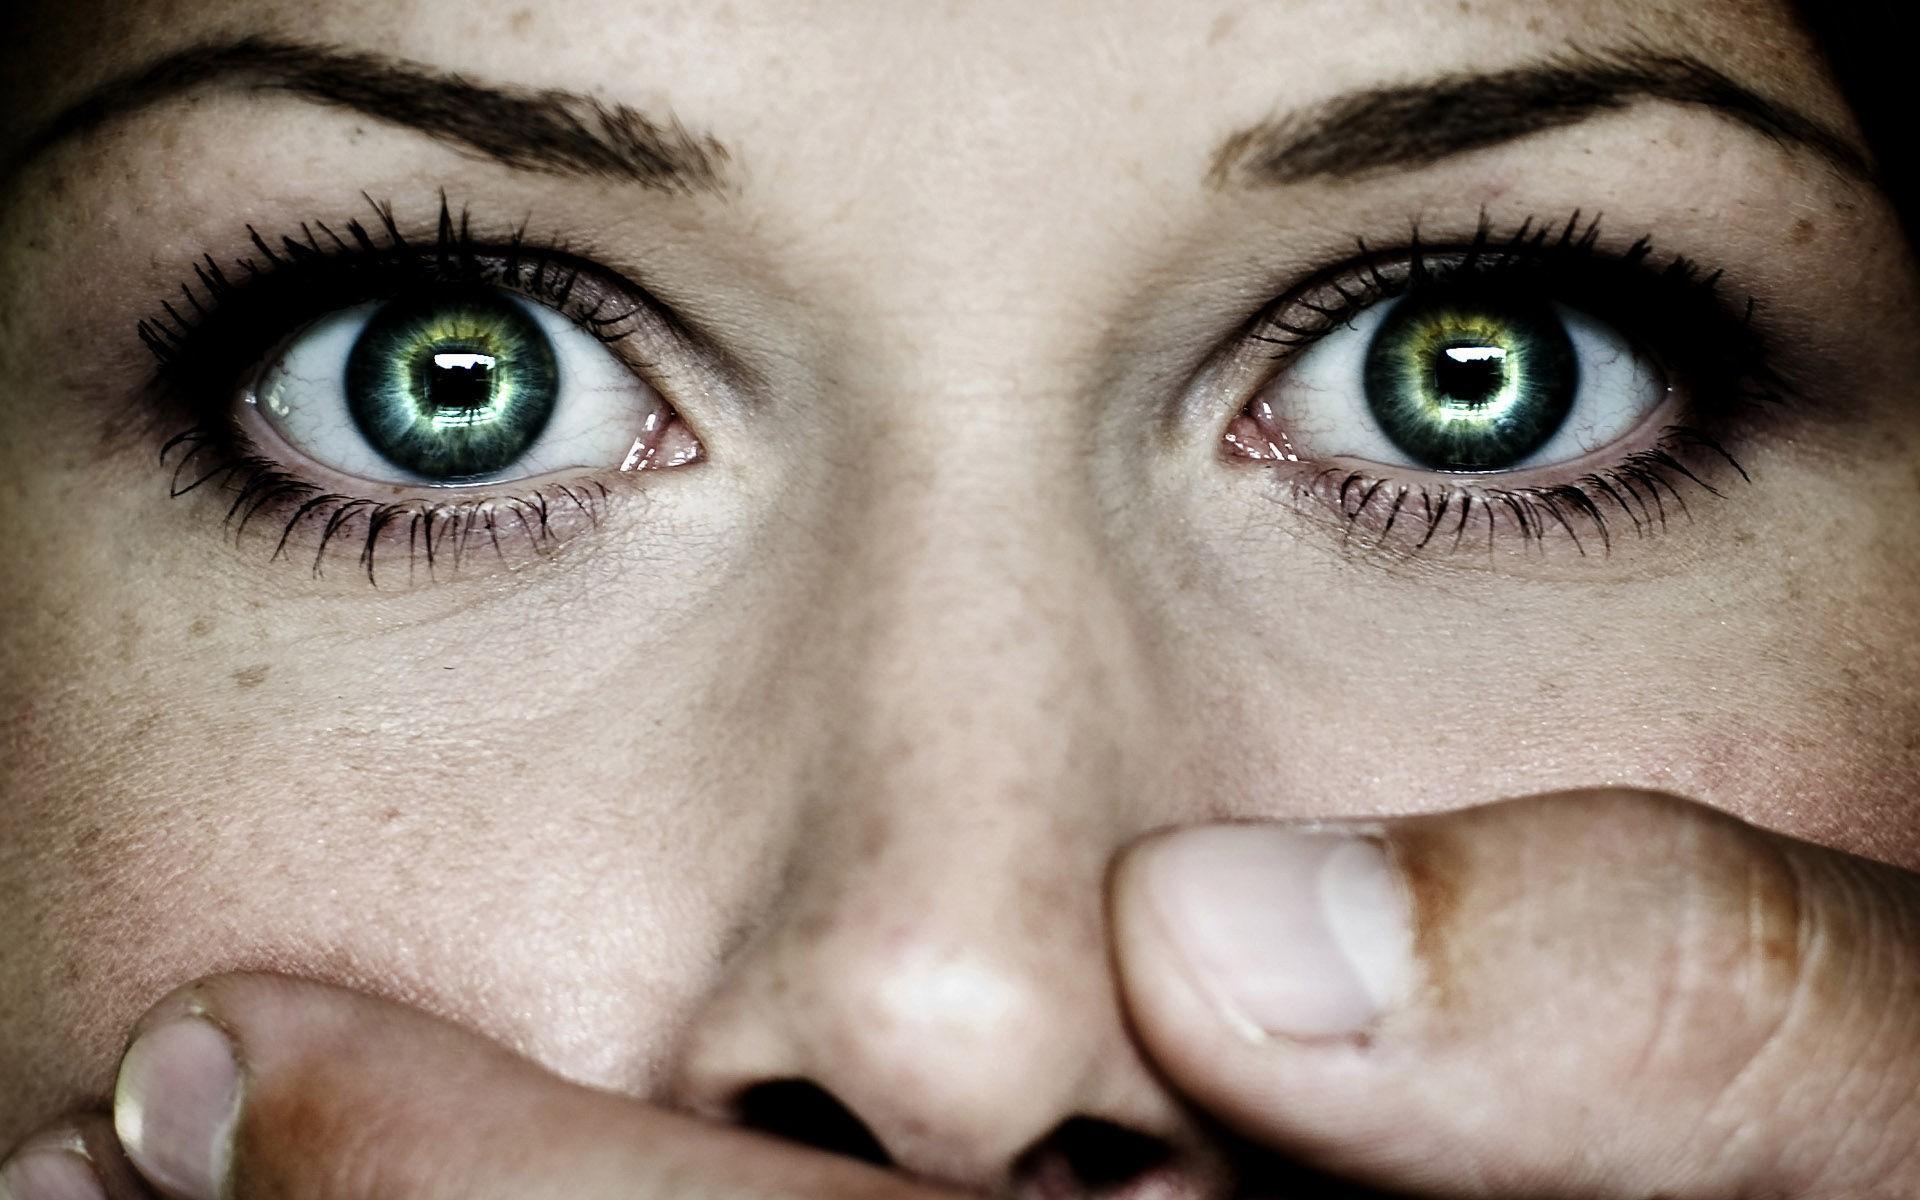 ВБашкирии ребенок пару лет насиловал малолетних сестер